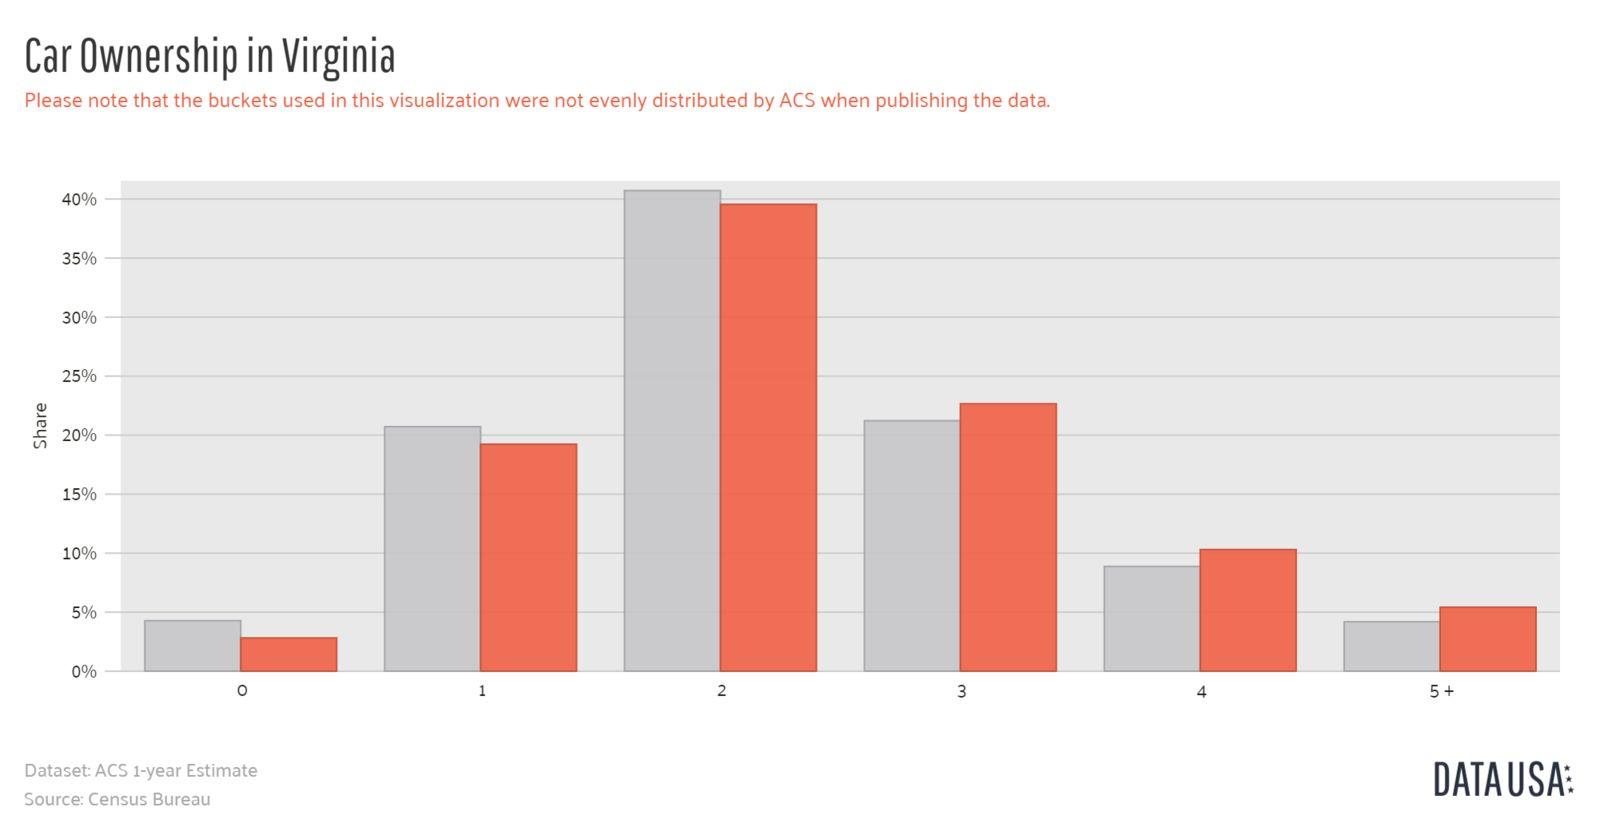 Data USA - Bar Chart of Car Ownership in Virginia-1600x1600